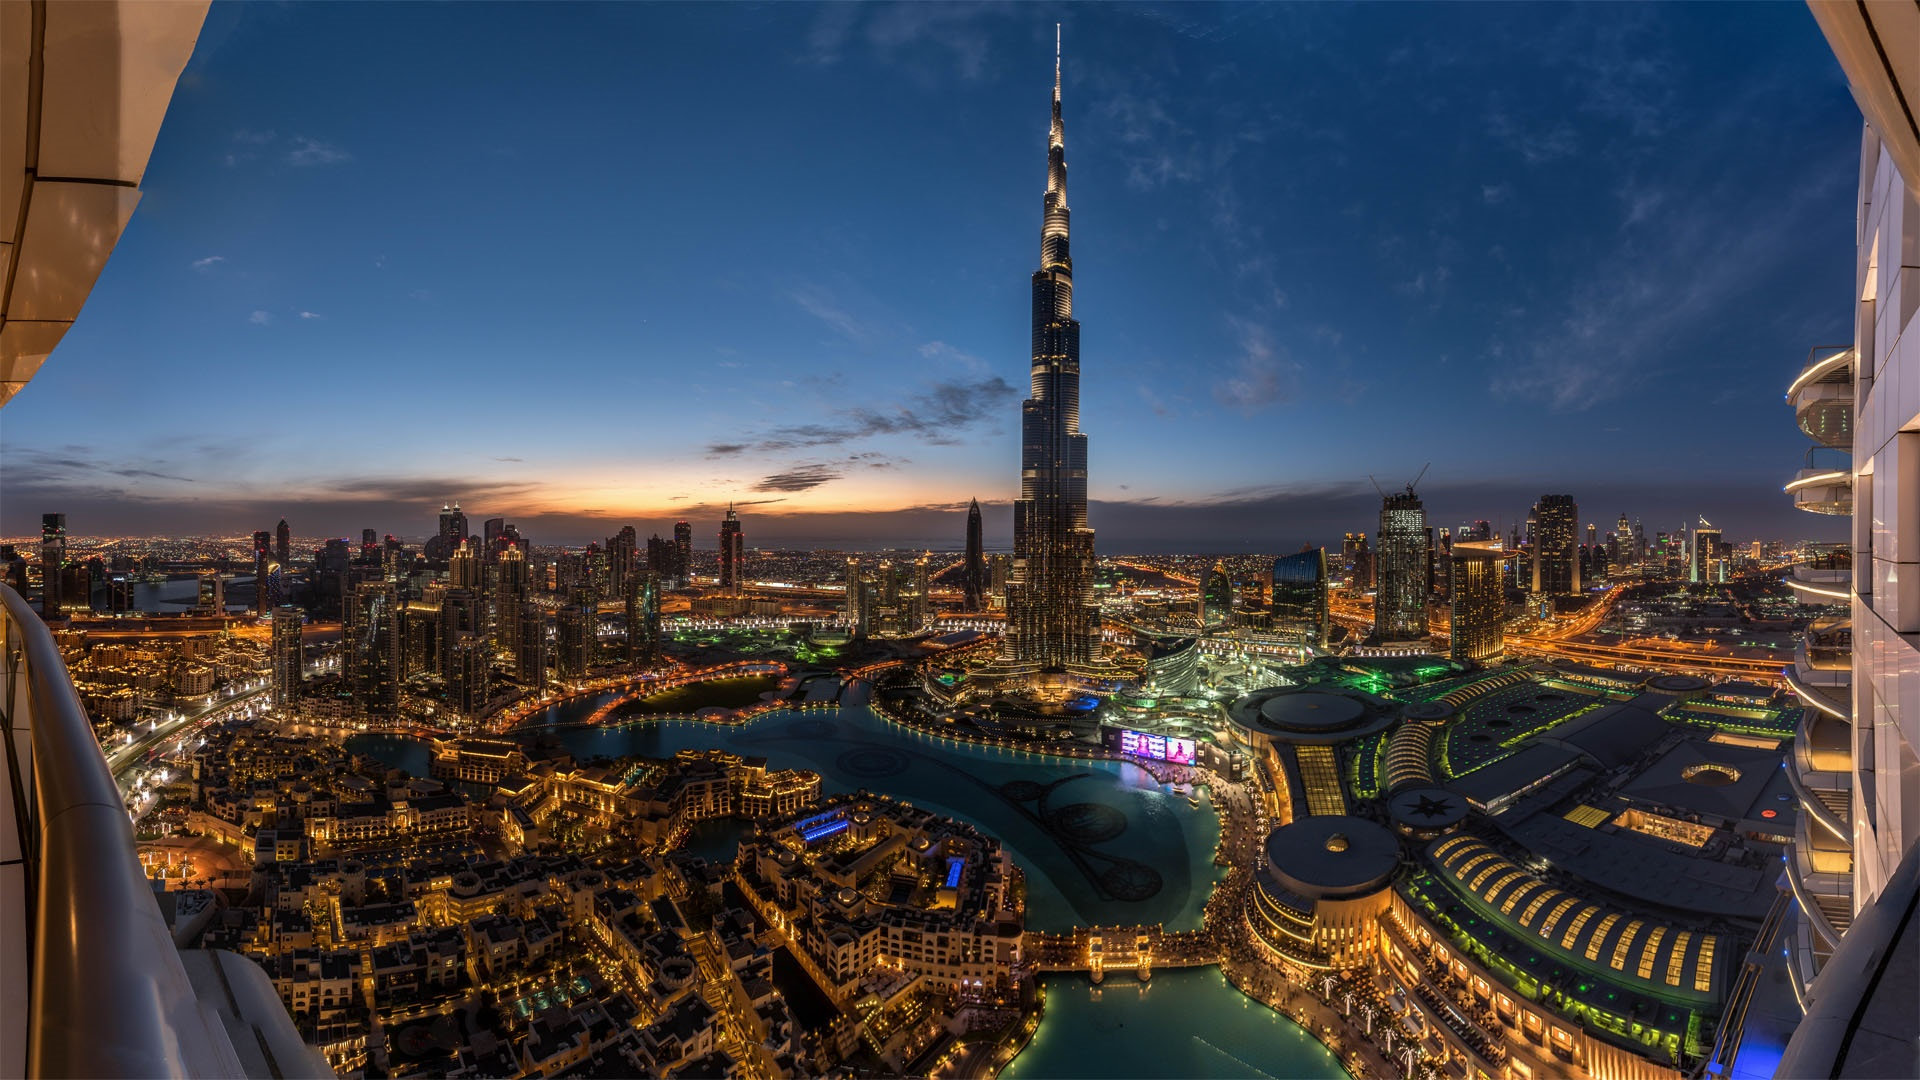 Burj khalifa dubai hd wallpaper backiee free ultra hd wallpaper platform - Dubai burj khalifa hd photos ...